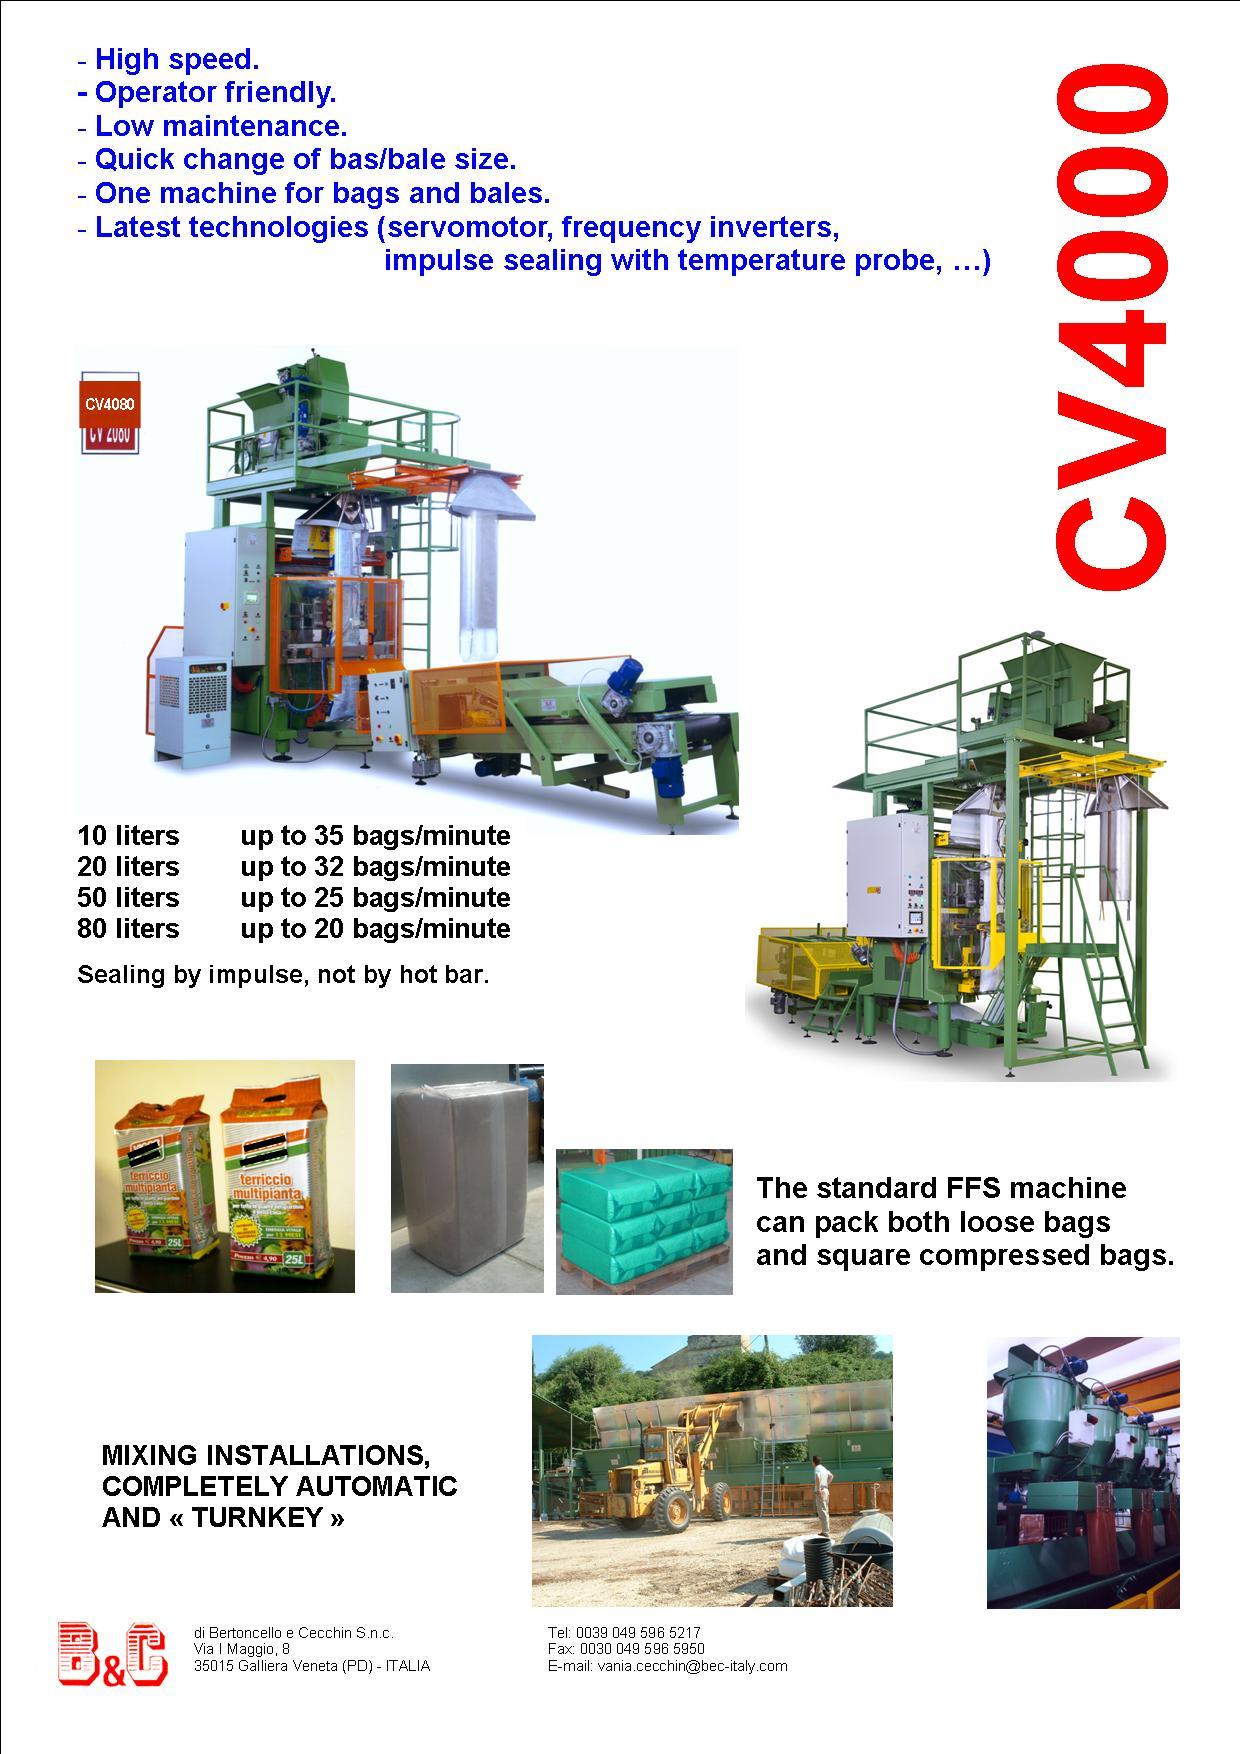 Ingl Cv4080dnpress80